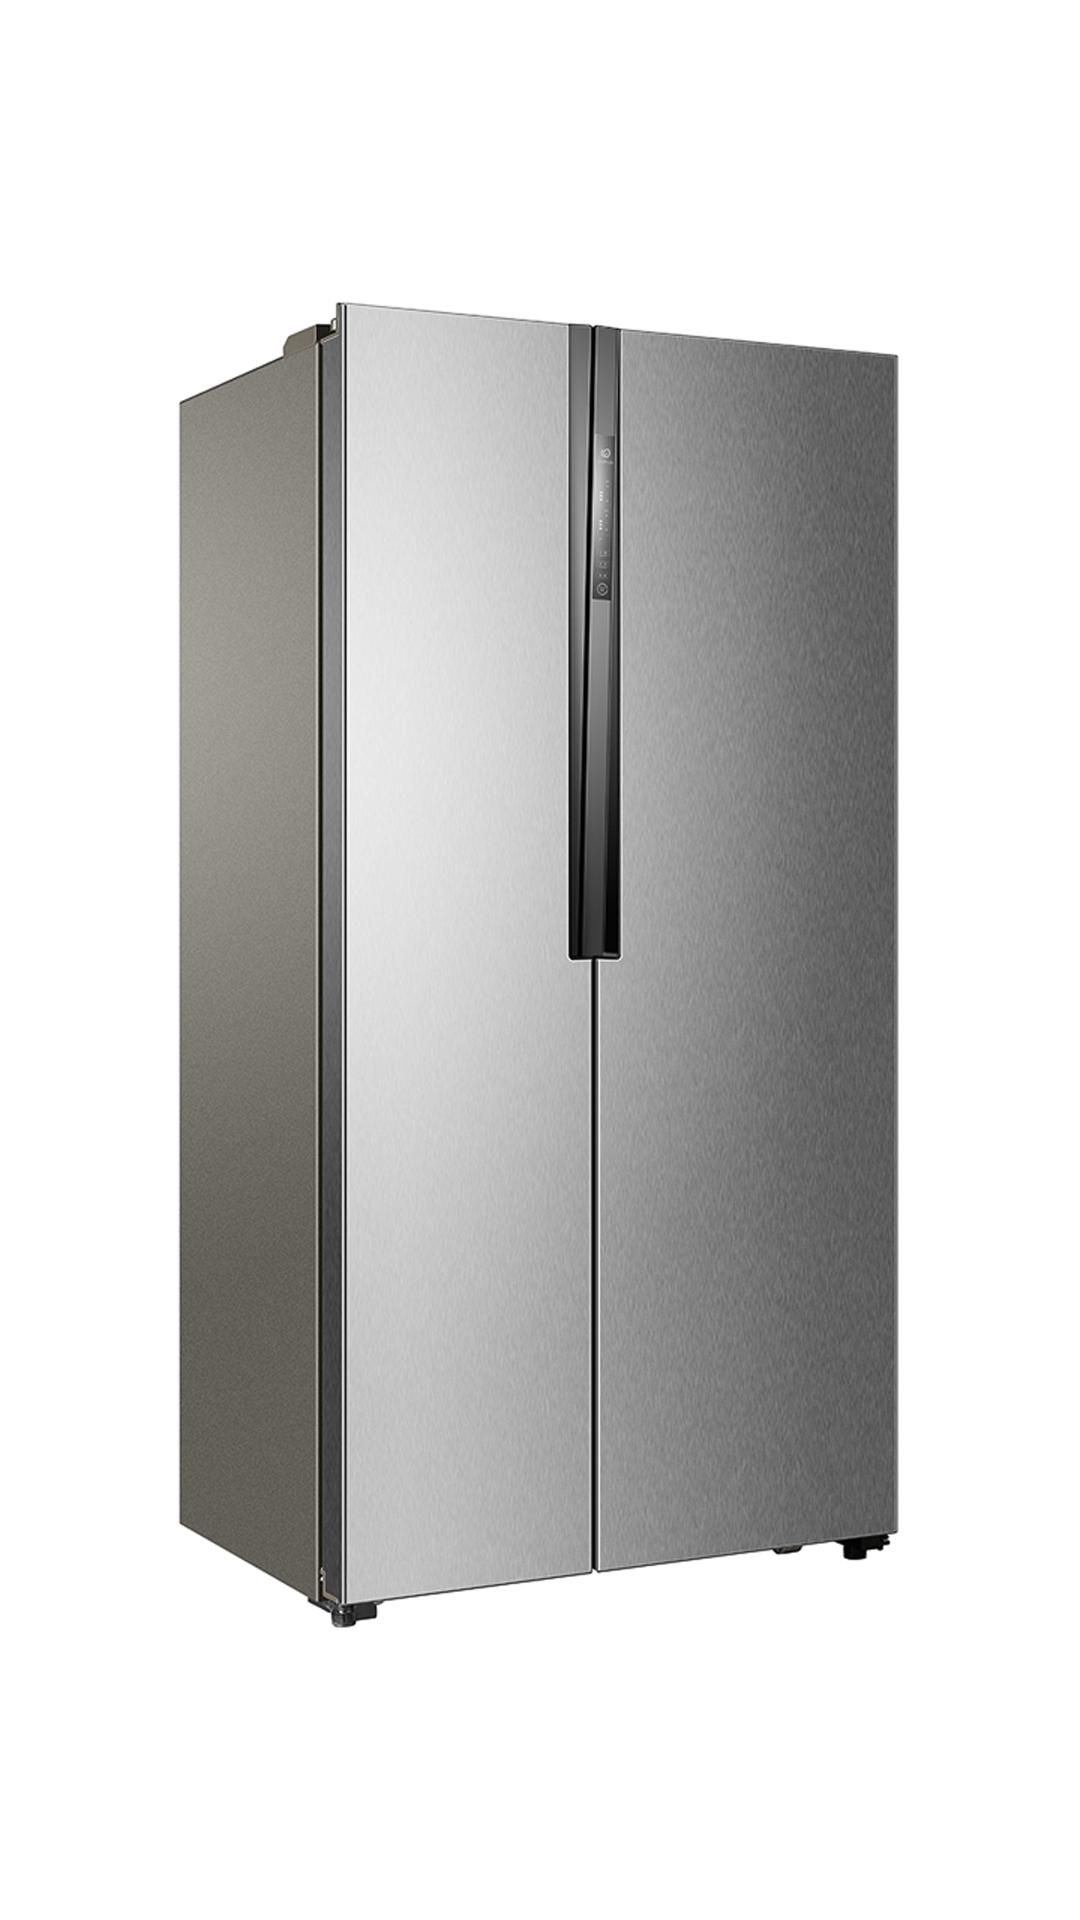 Haier HRF 618 SS 565 L Side By Side Refrigerator